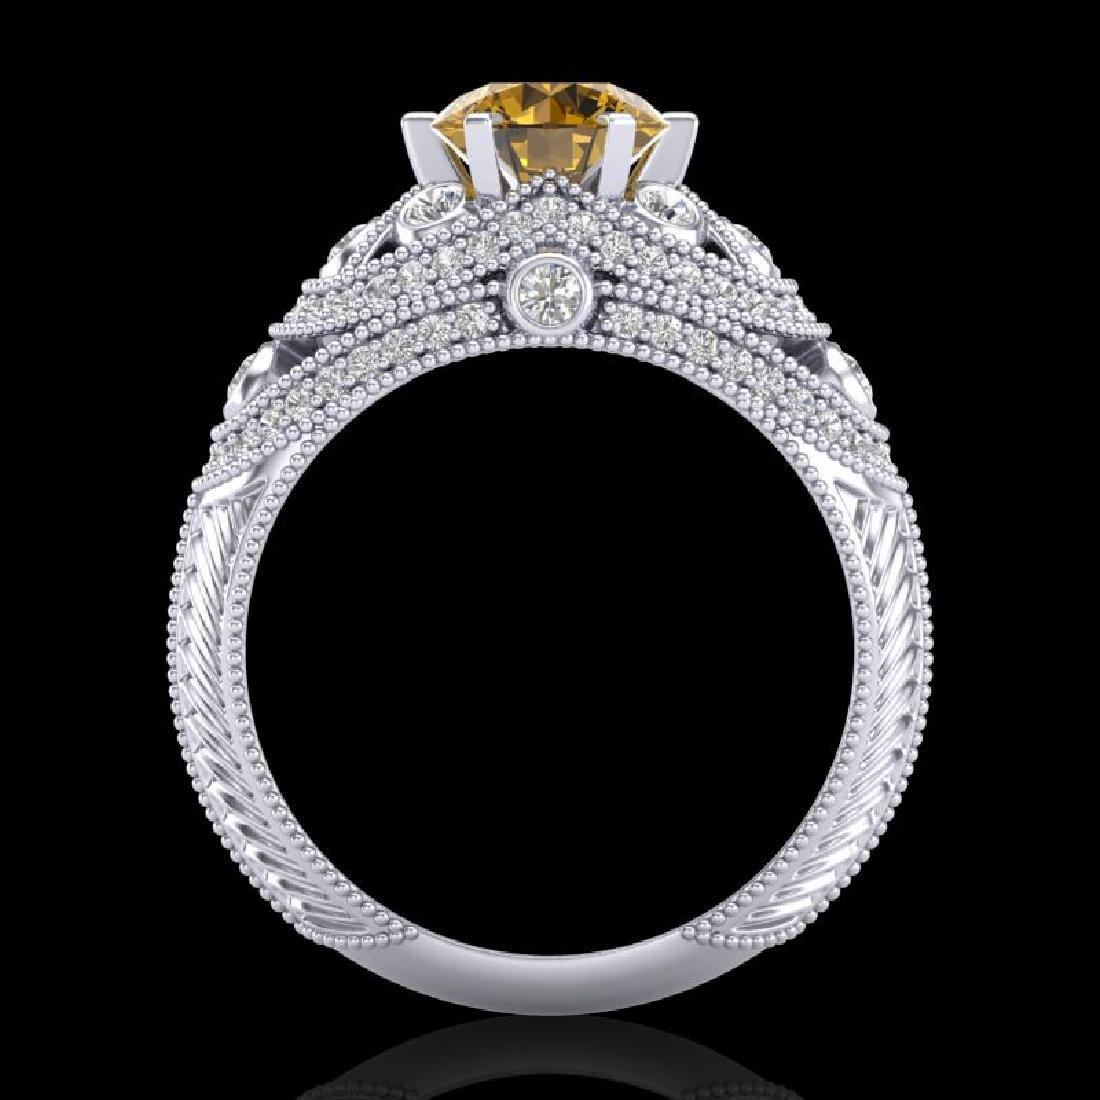 2 CTW Intense Yellow Diamond Solitaire Engagement Art - 3